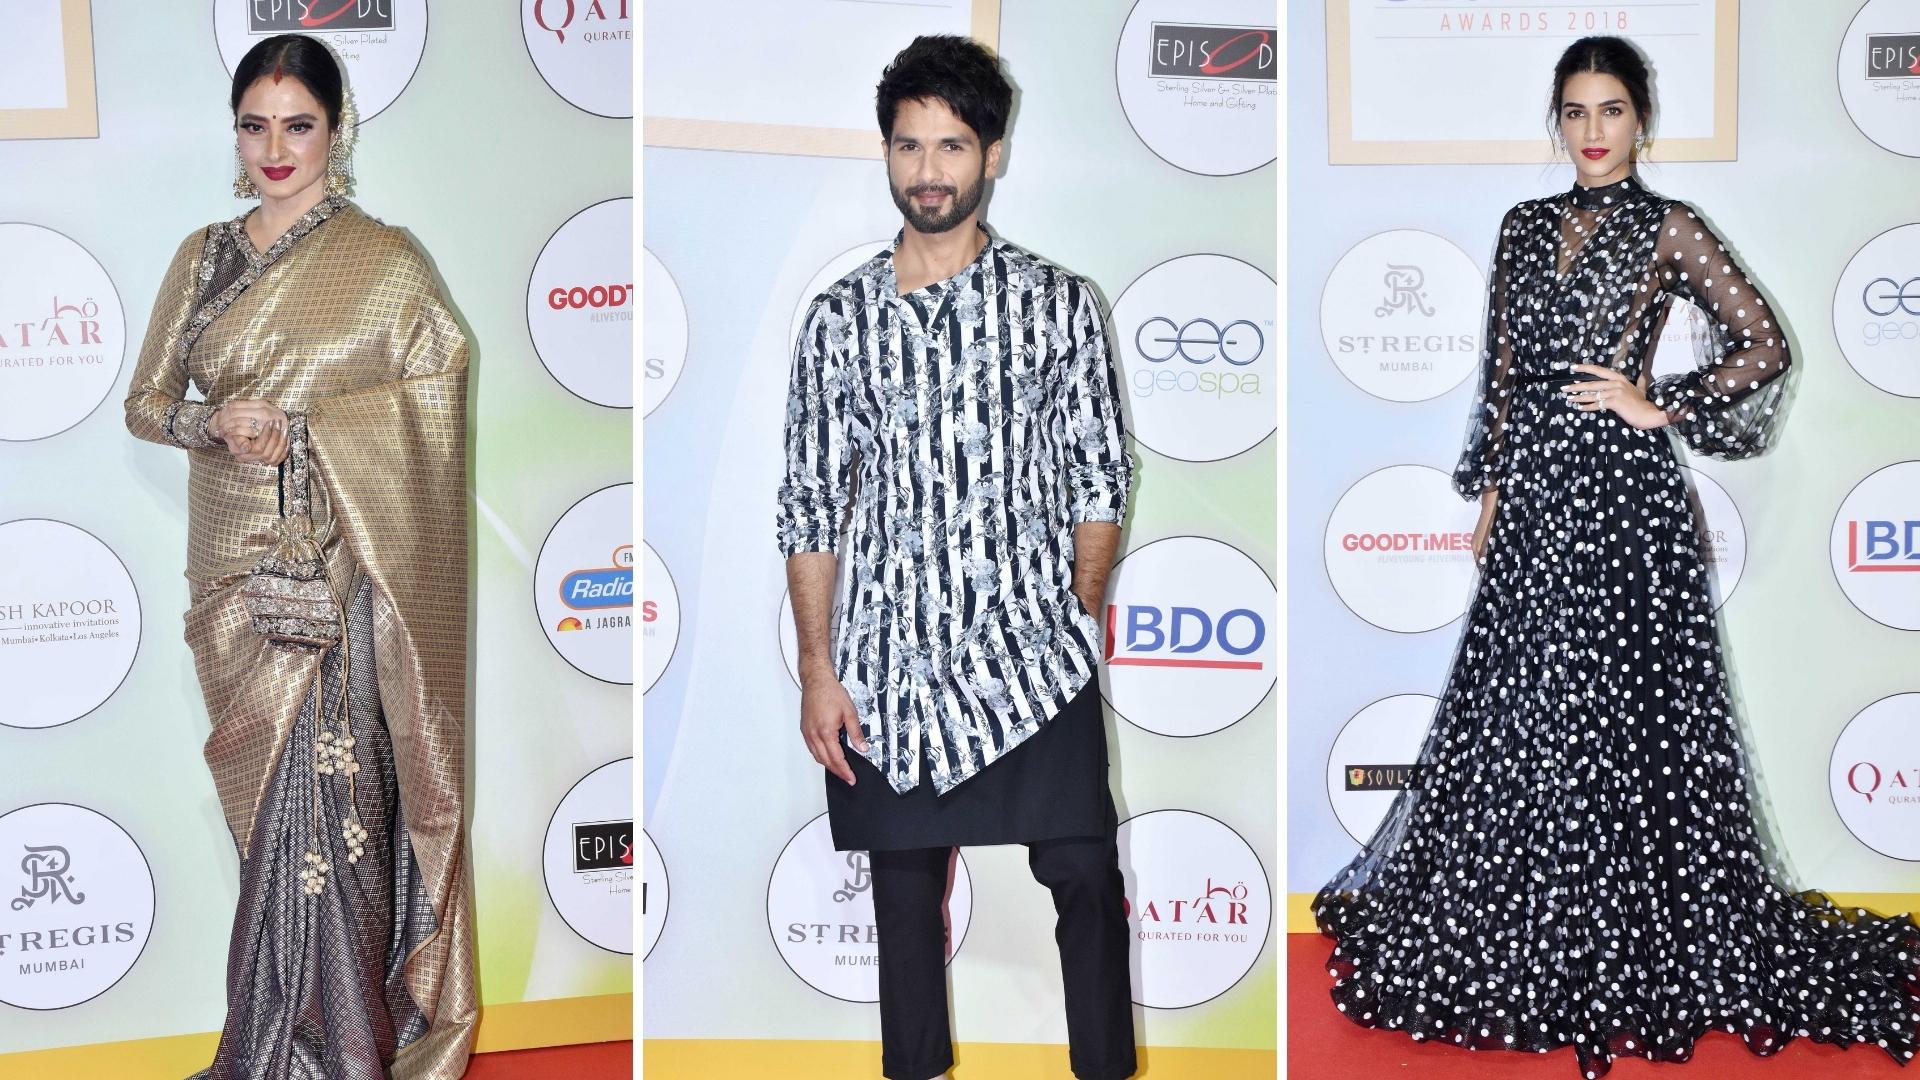 In Pics: Kriti Sanon, Rekha, Shahid's Sizzling Red Carpet Looks